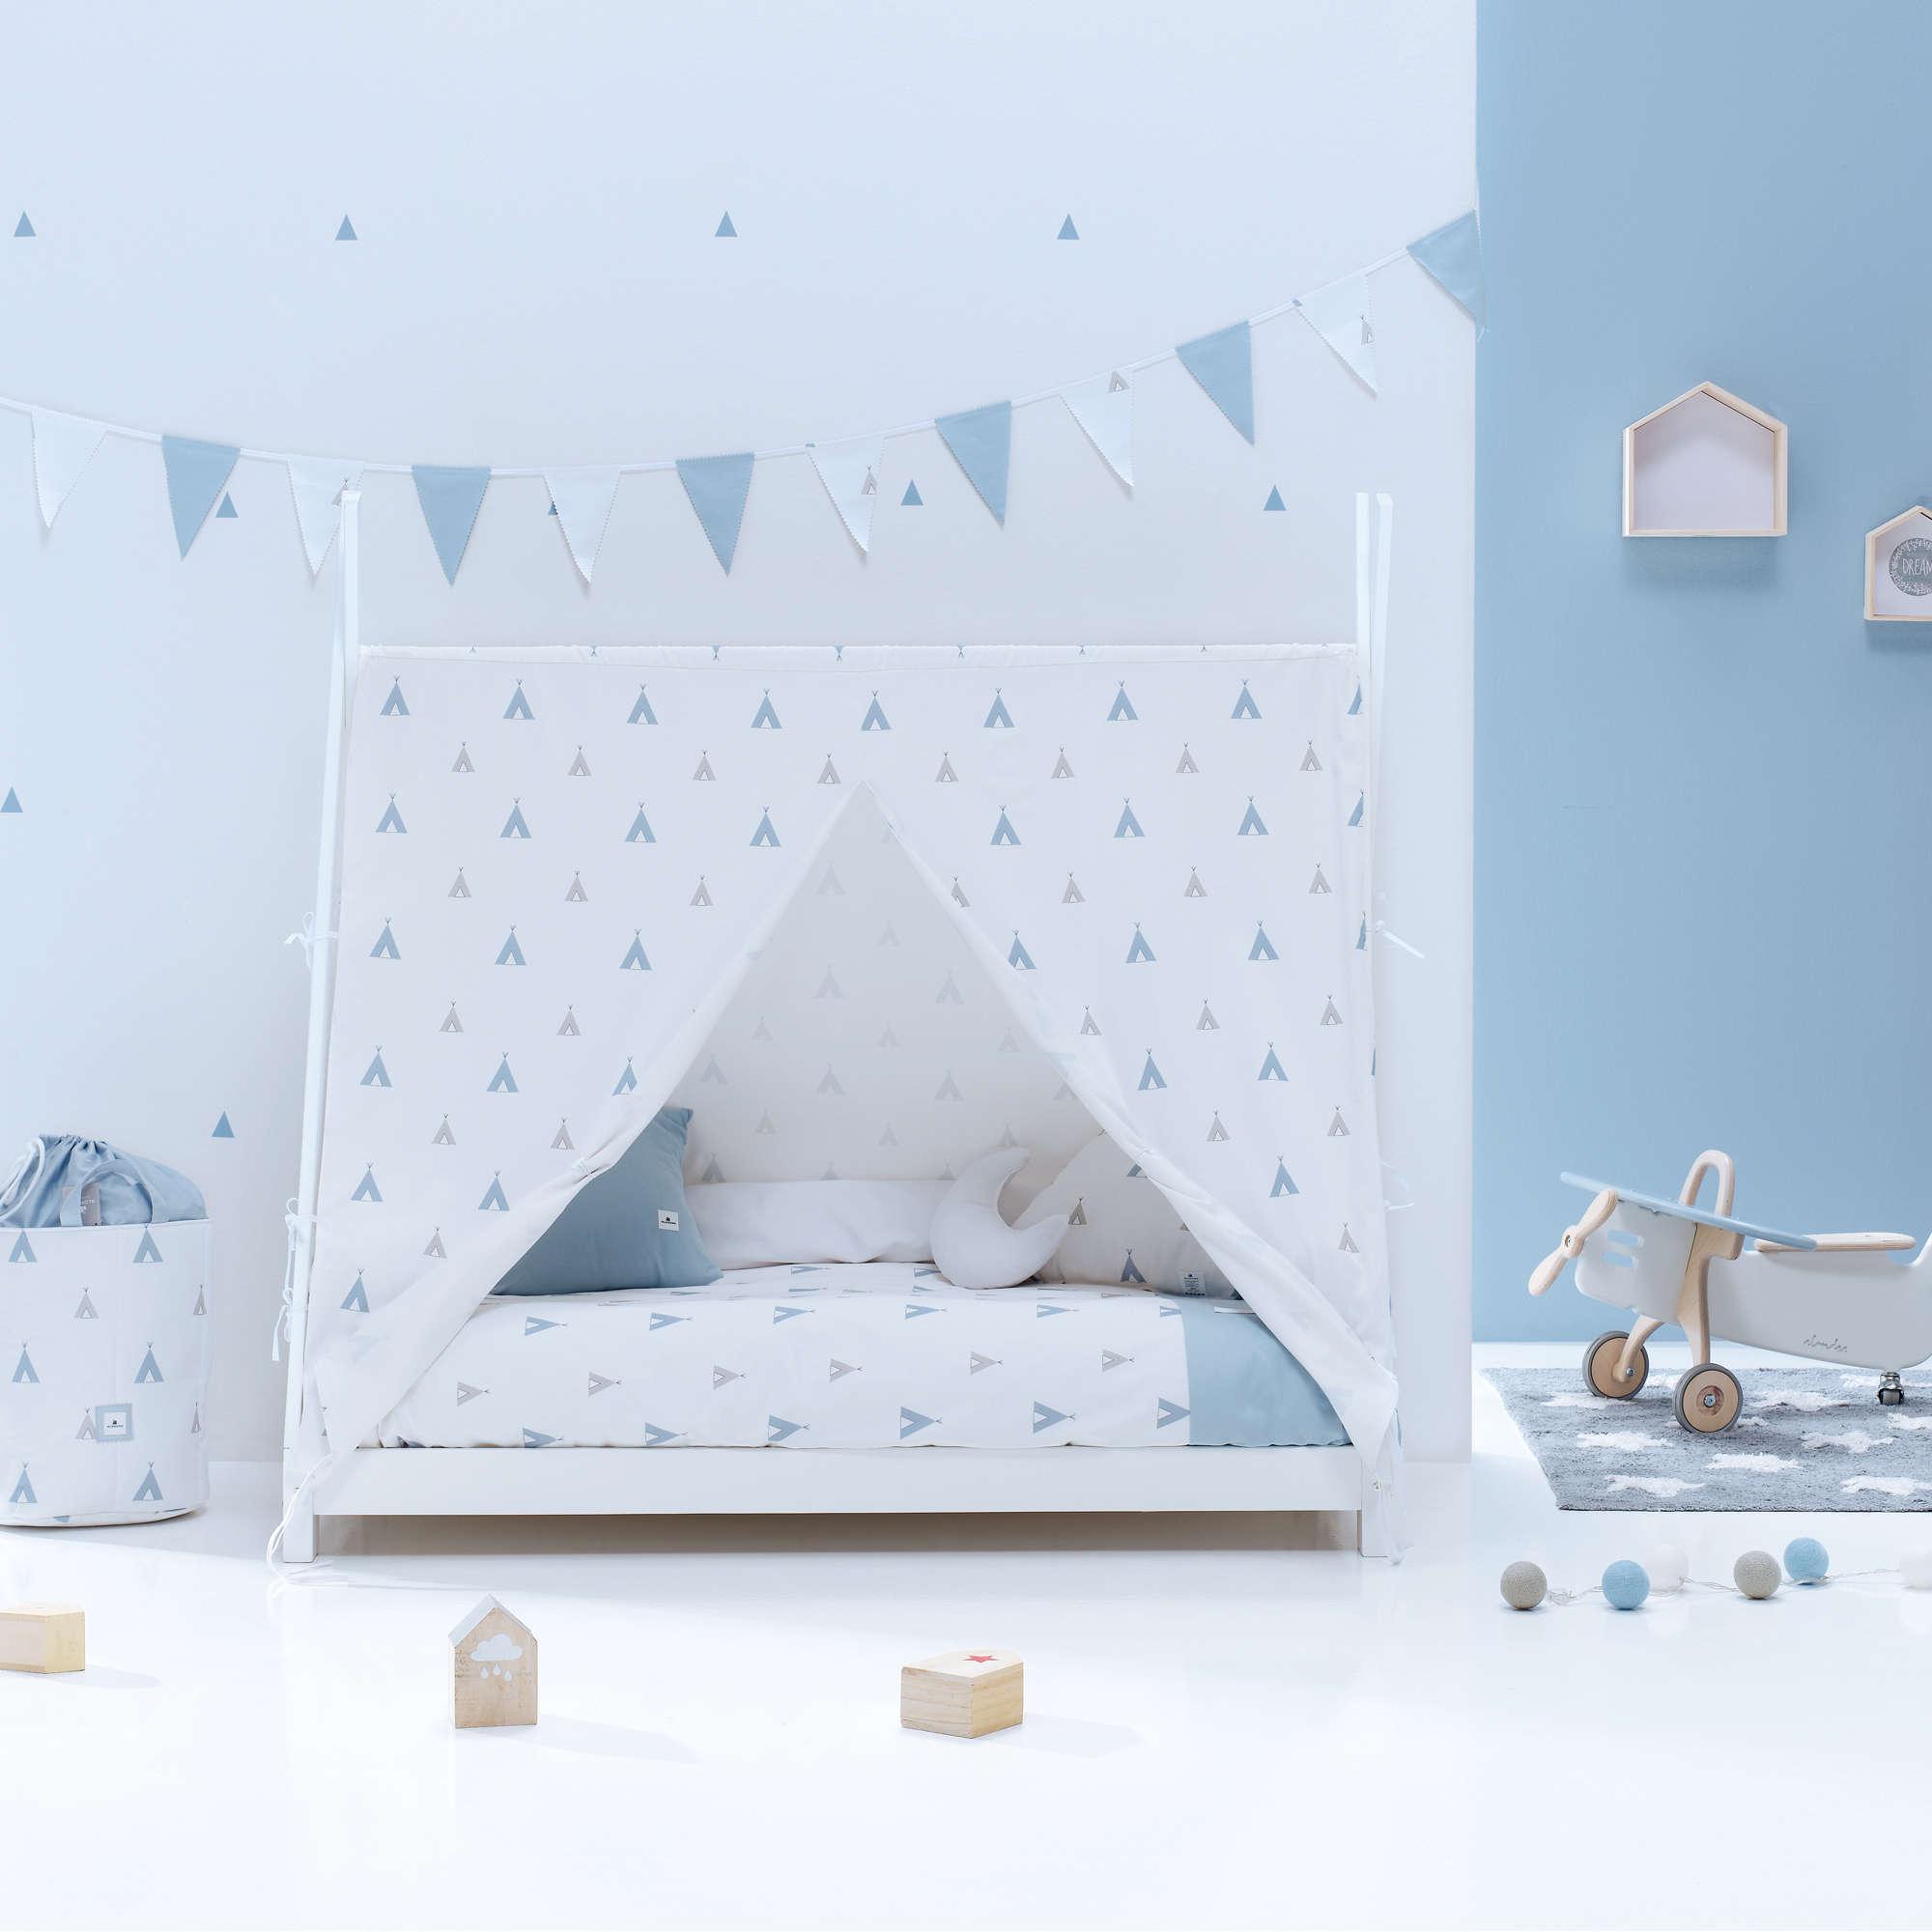 Cama Montessori Indy en azul para niño Alondra